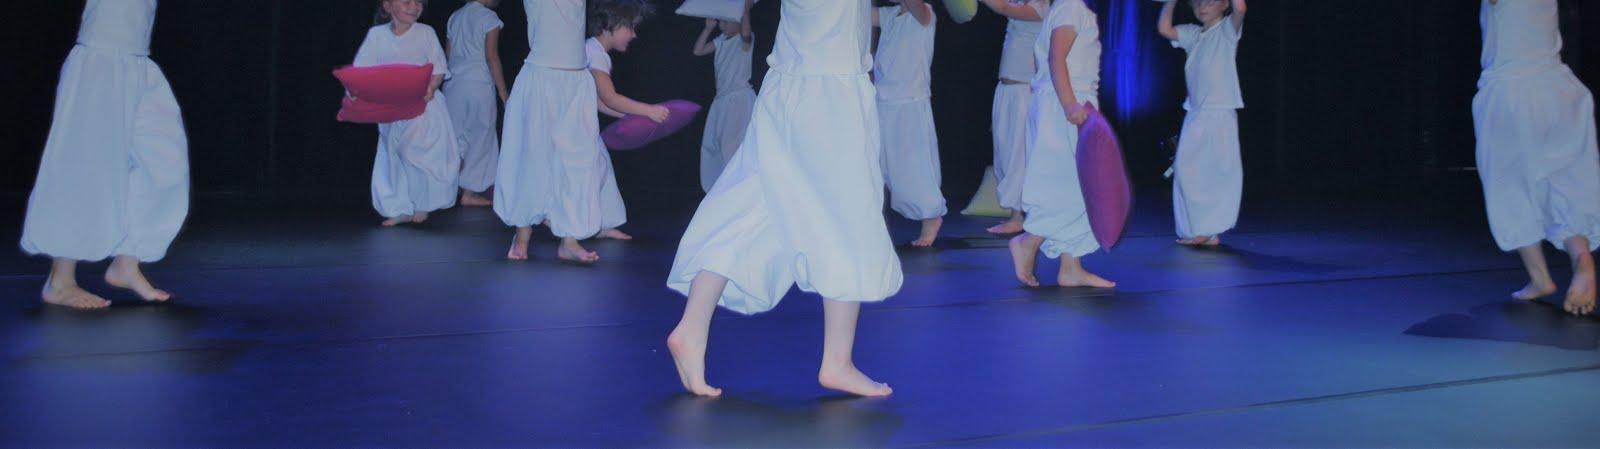 Carhaixment Danse